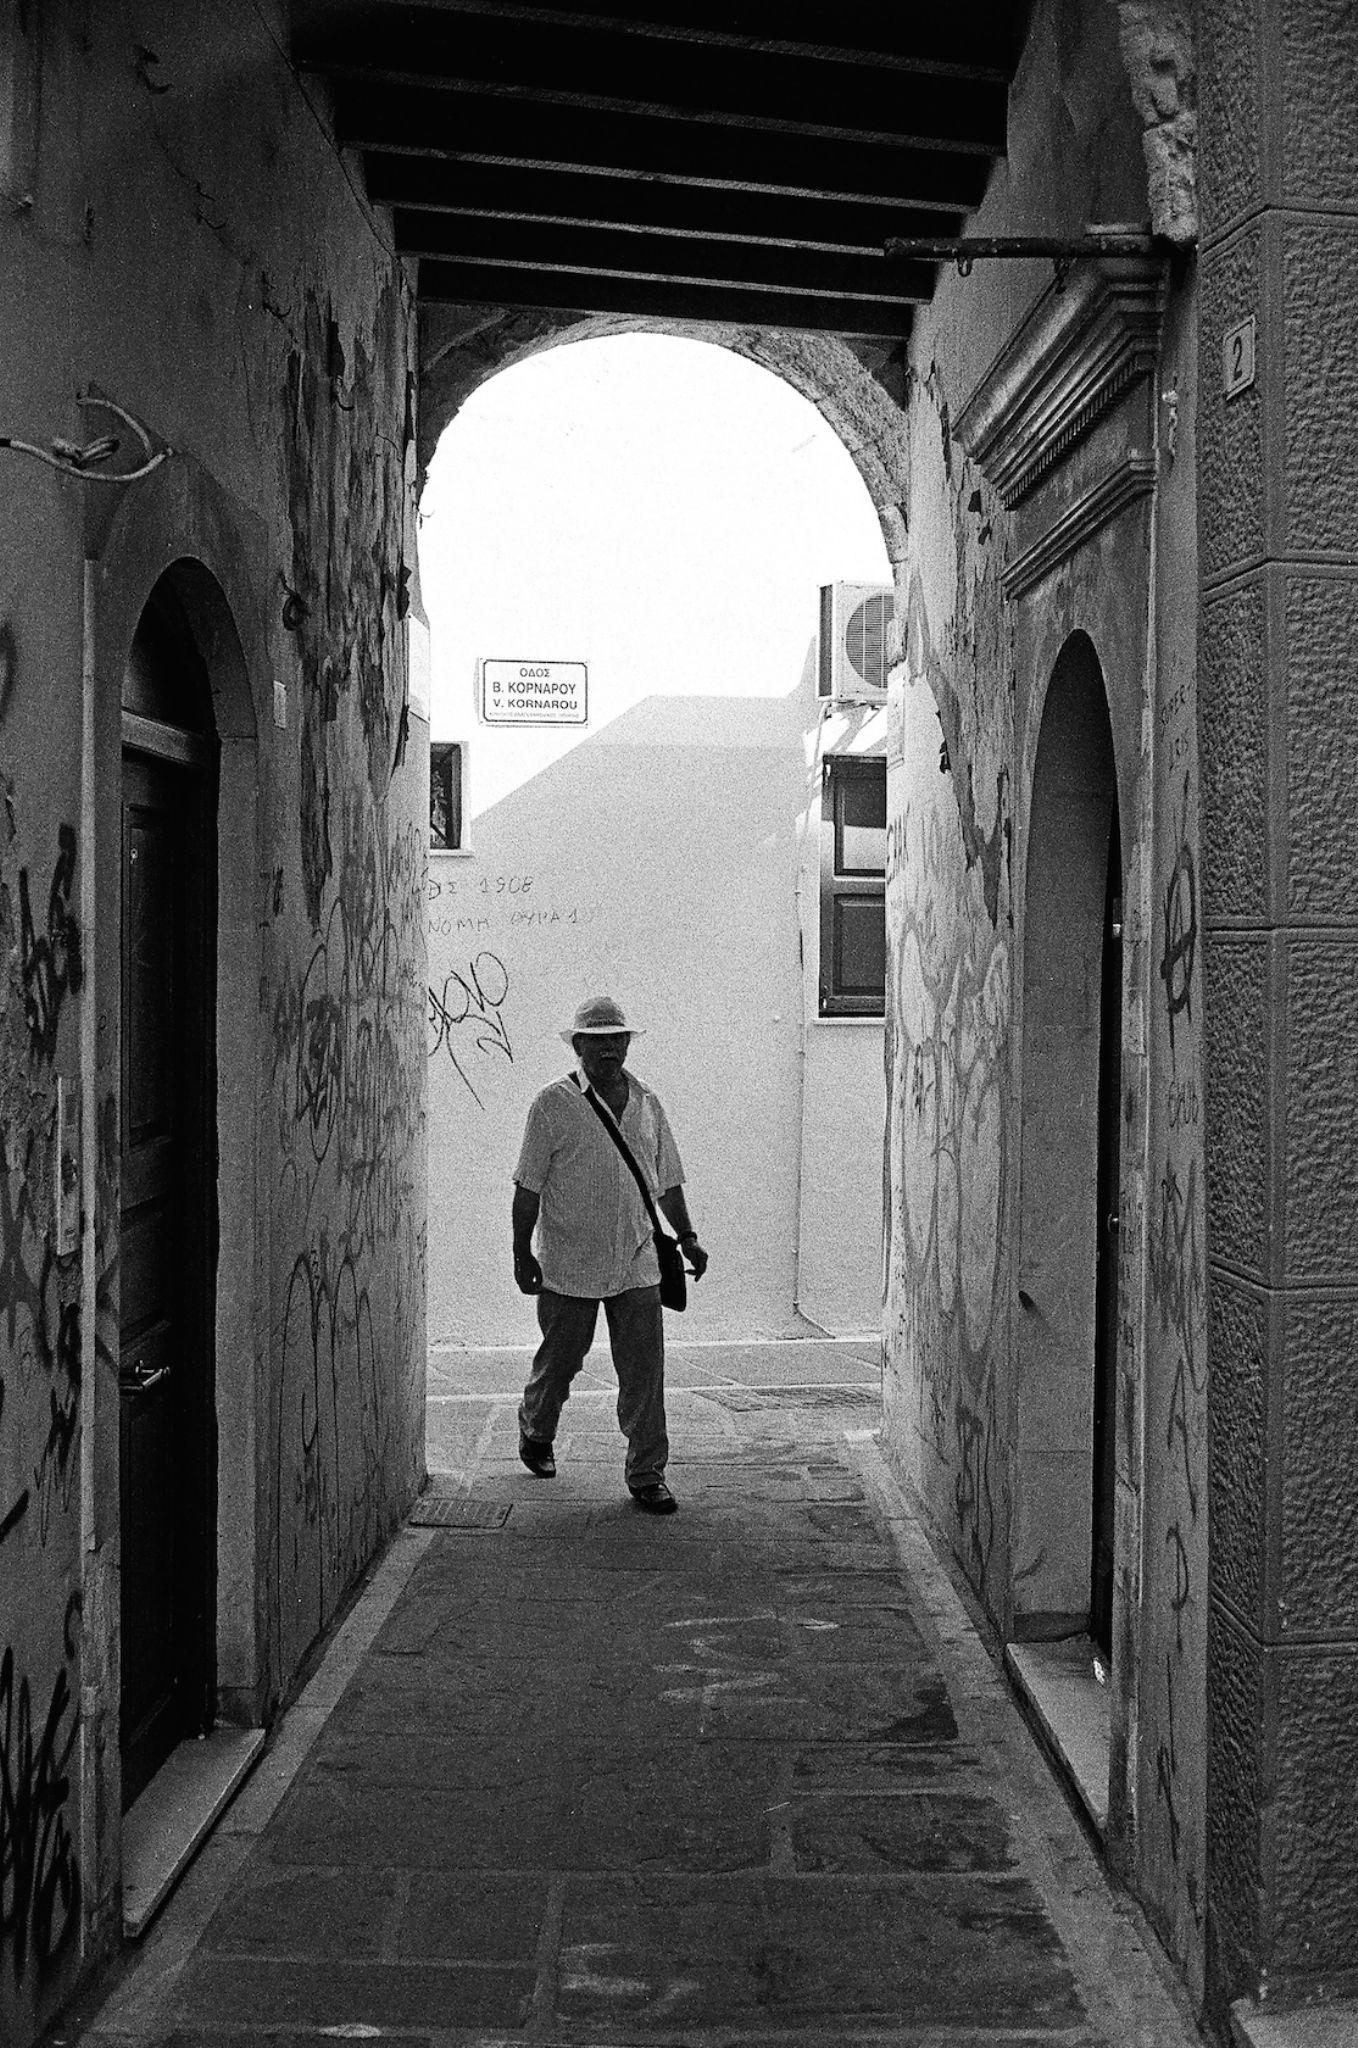 Under the archway by Spyros Papaspyropoulos